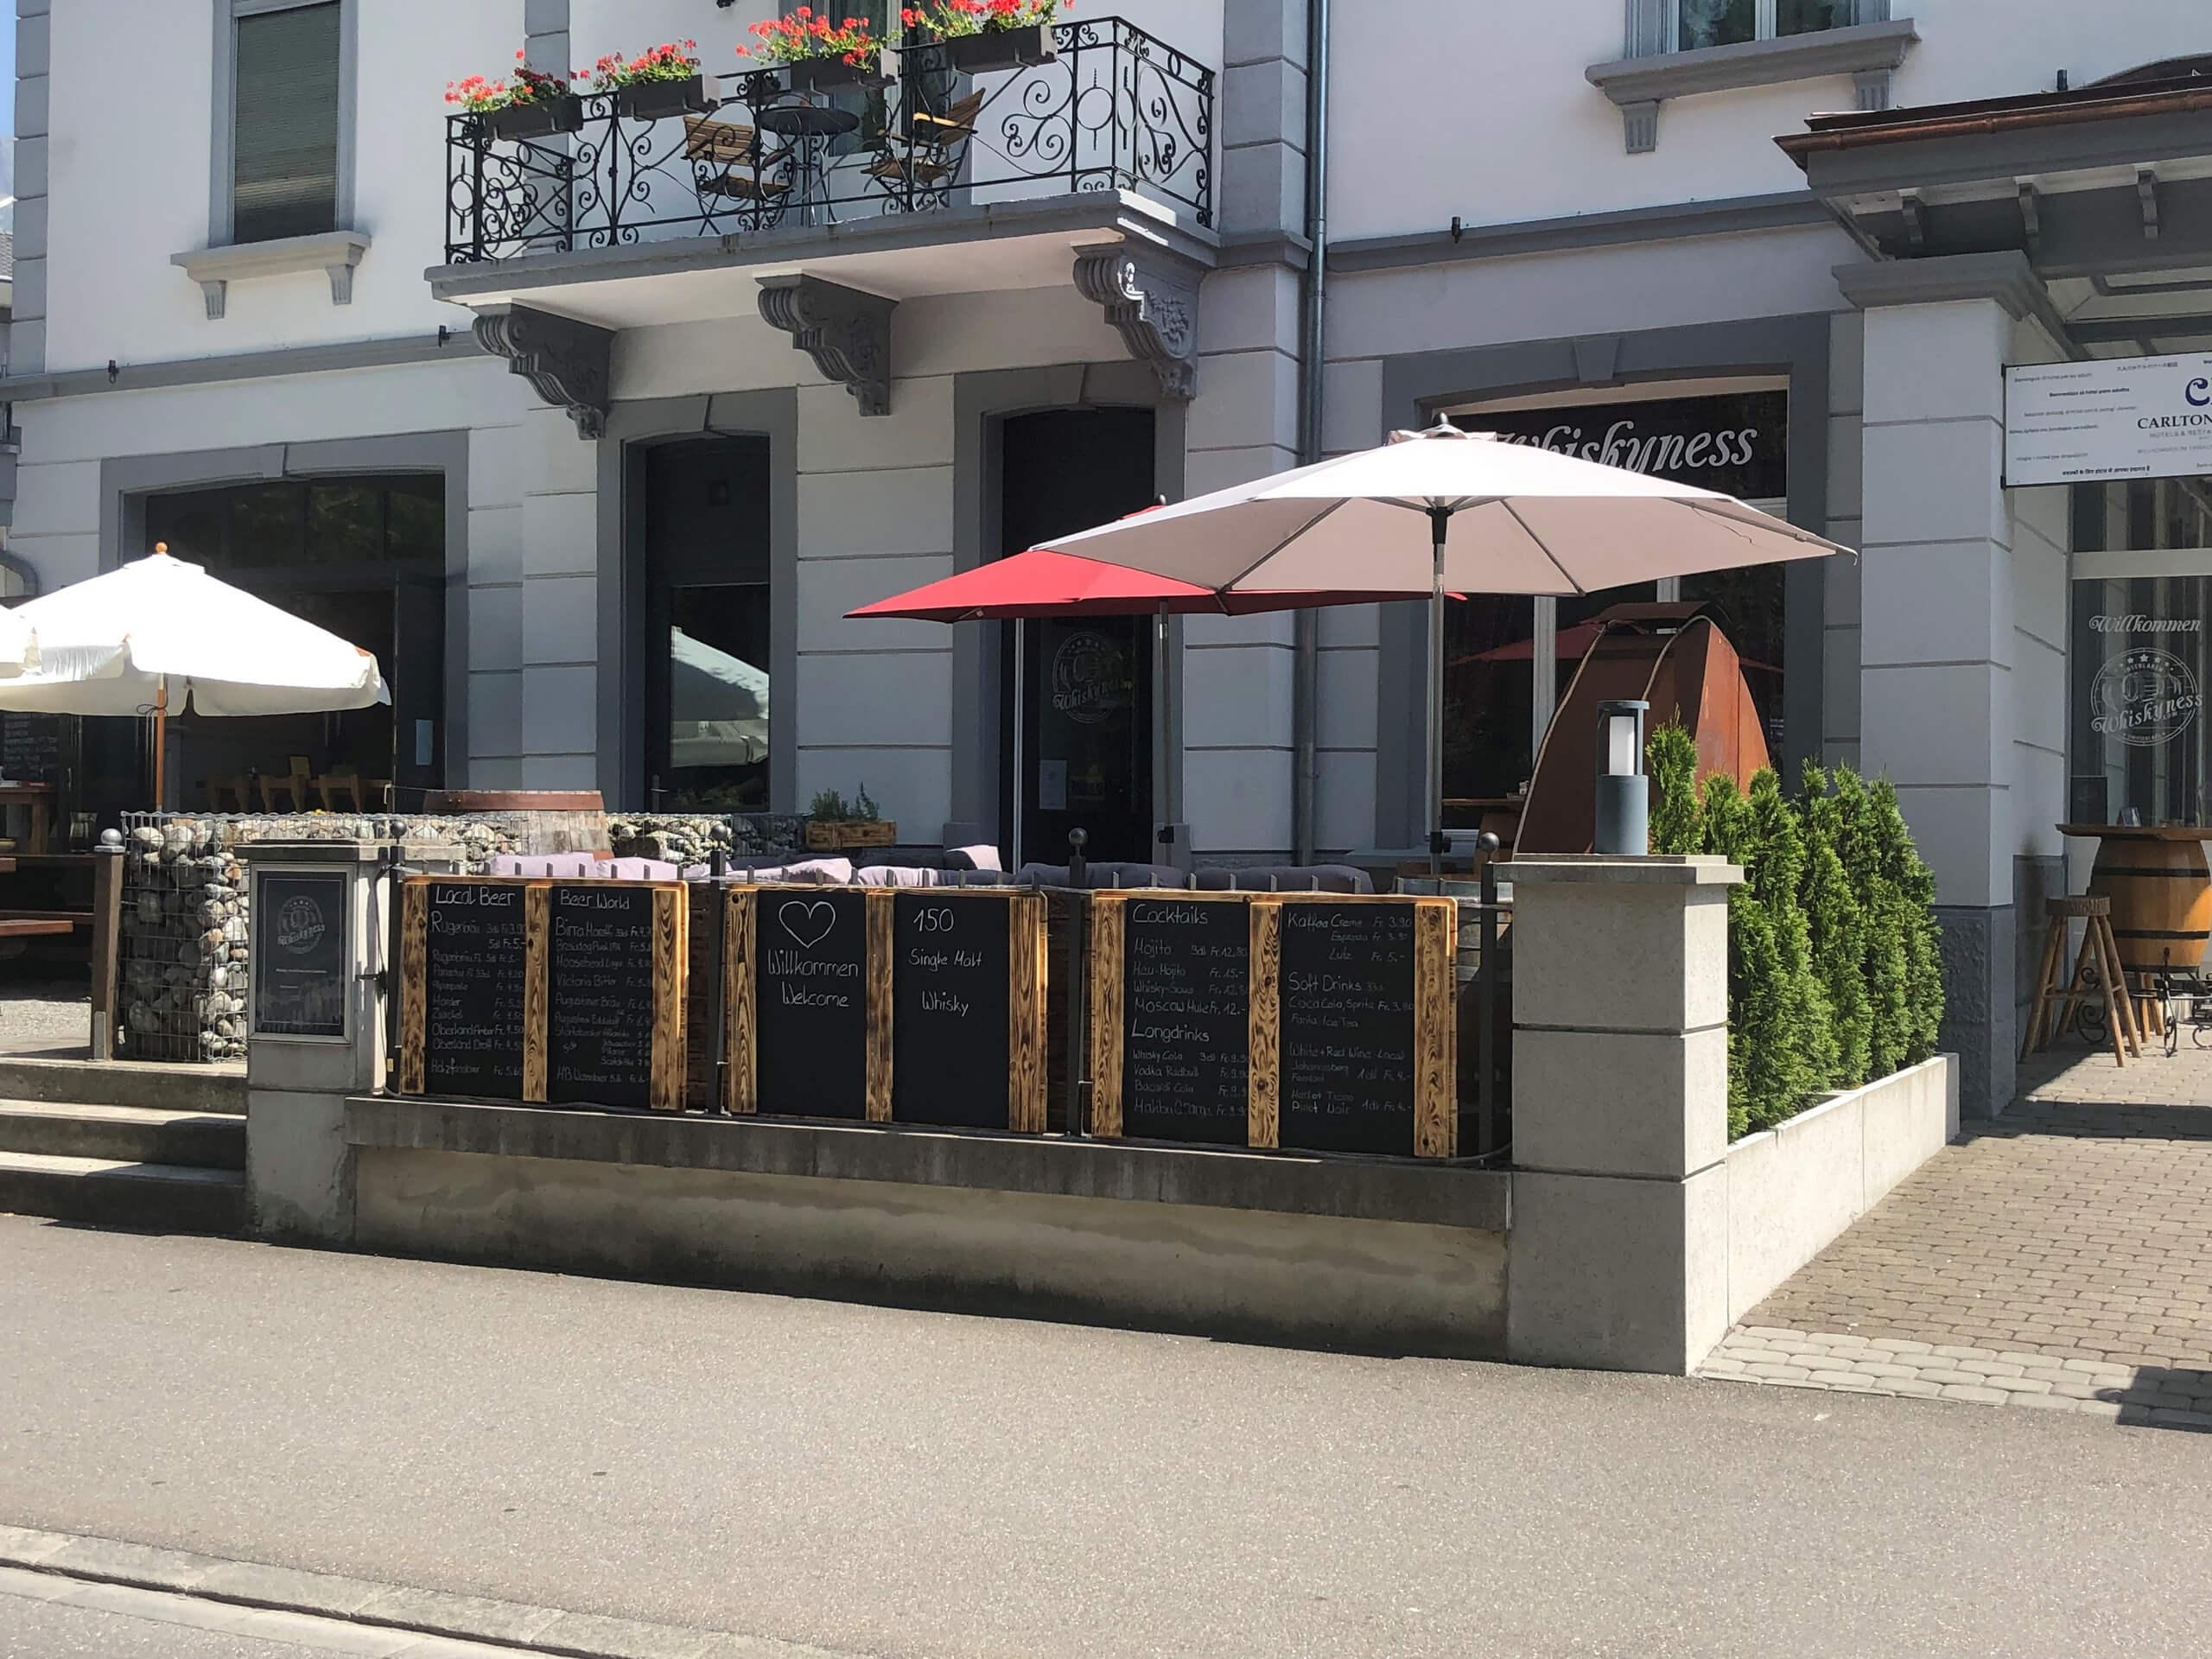 whiskyness-bar-lounge-aussenansicht-terrasse